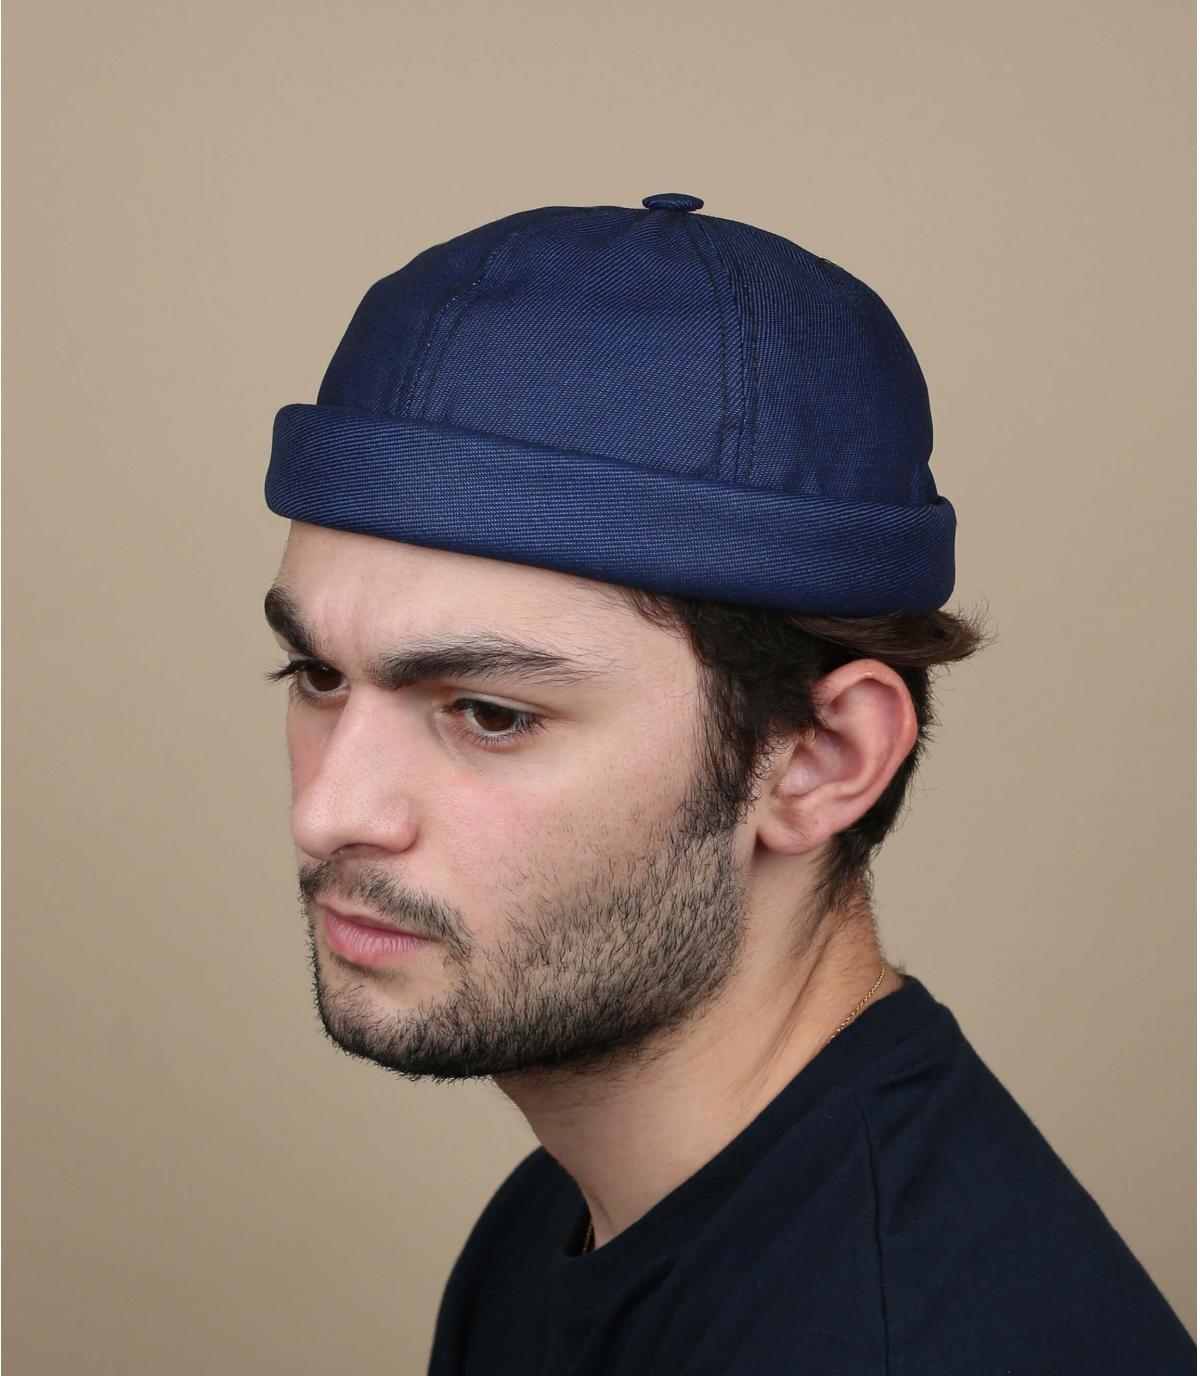 Mütze Docker navy blau